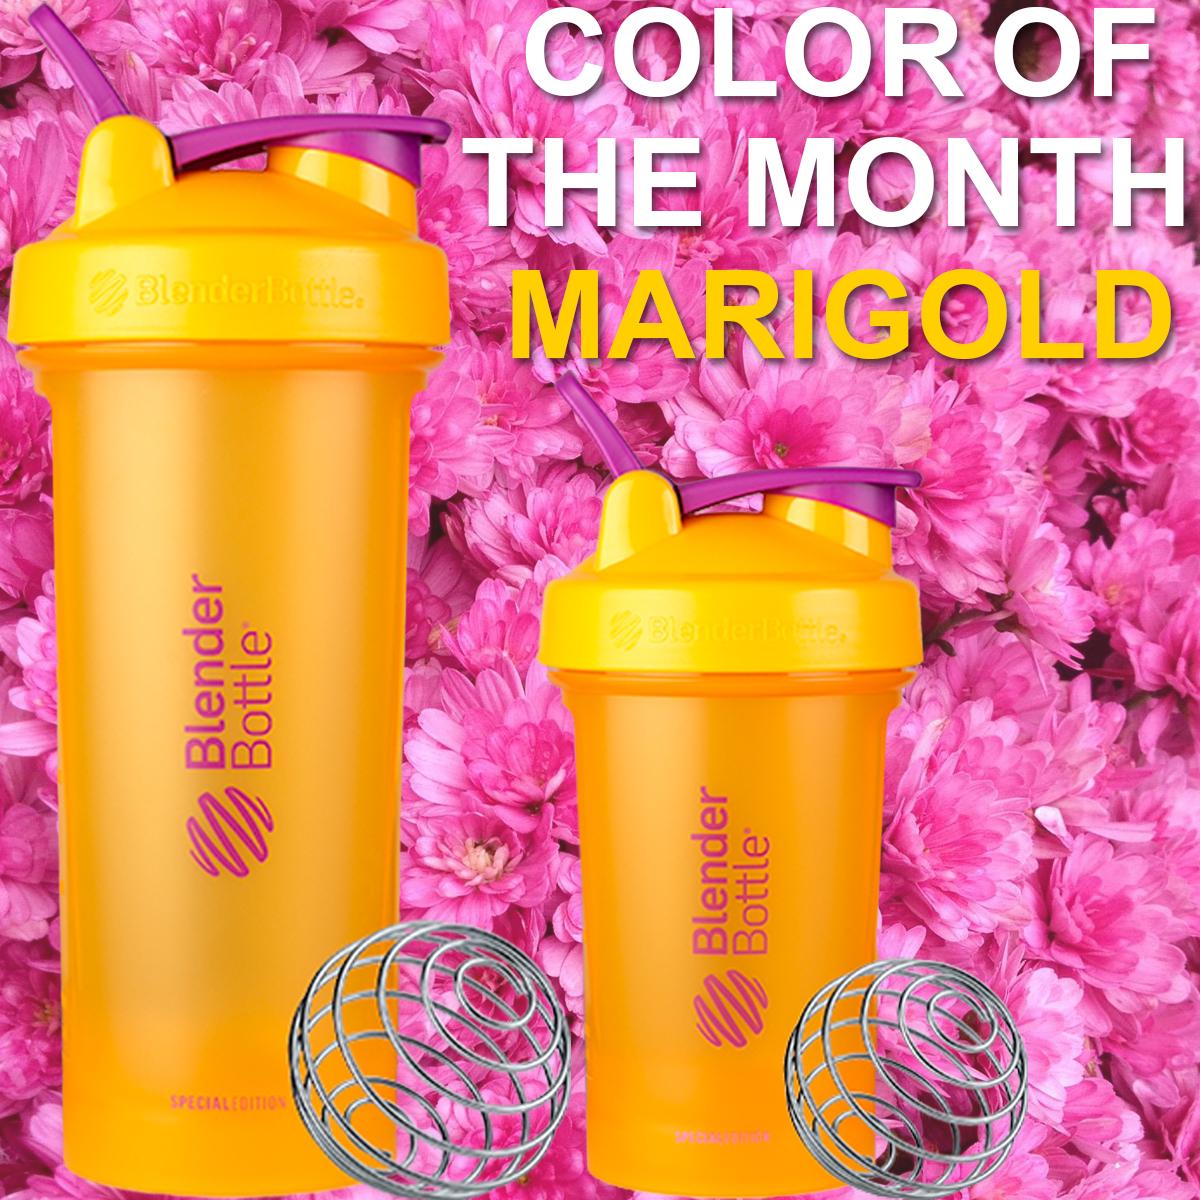 cotm-marigold